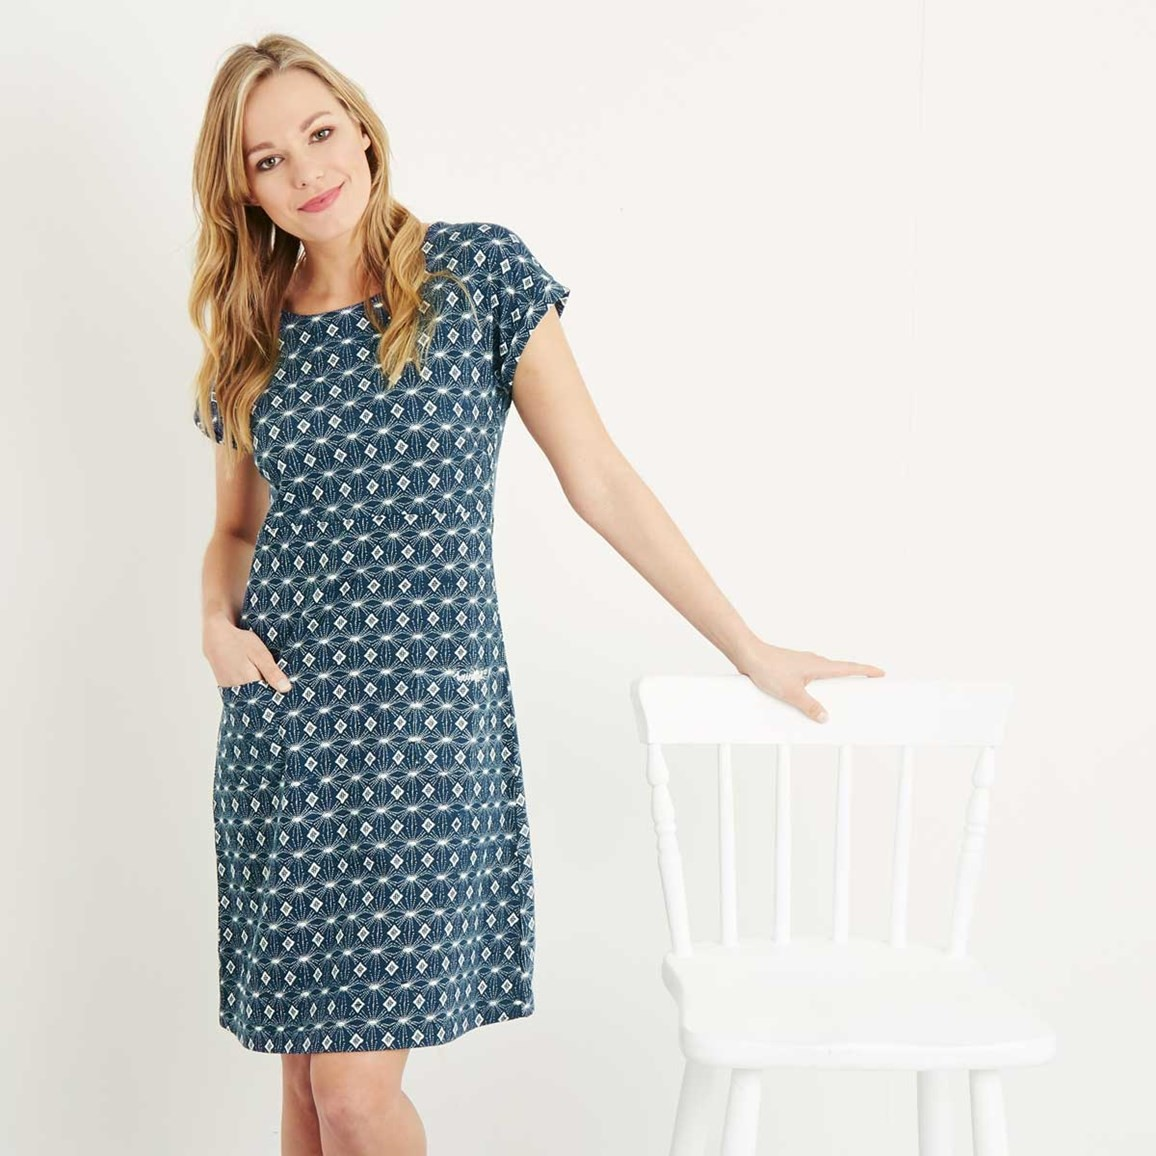 c37e2ac37cb6b Tallahassee Printed Cotton Jersey Dress Ink